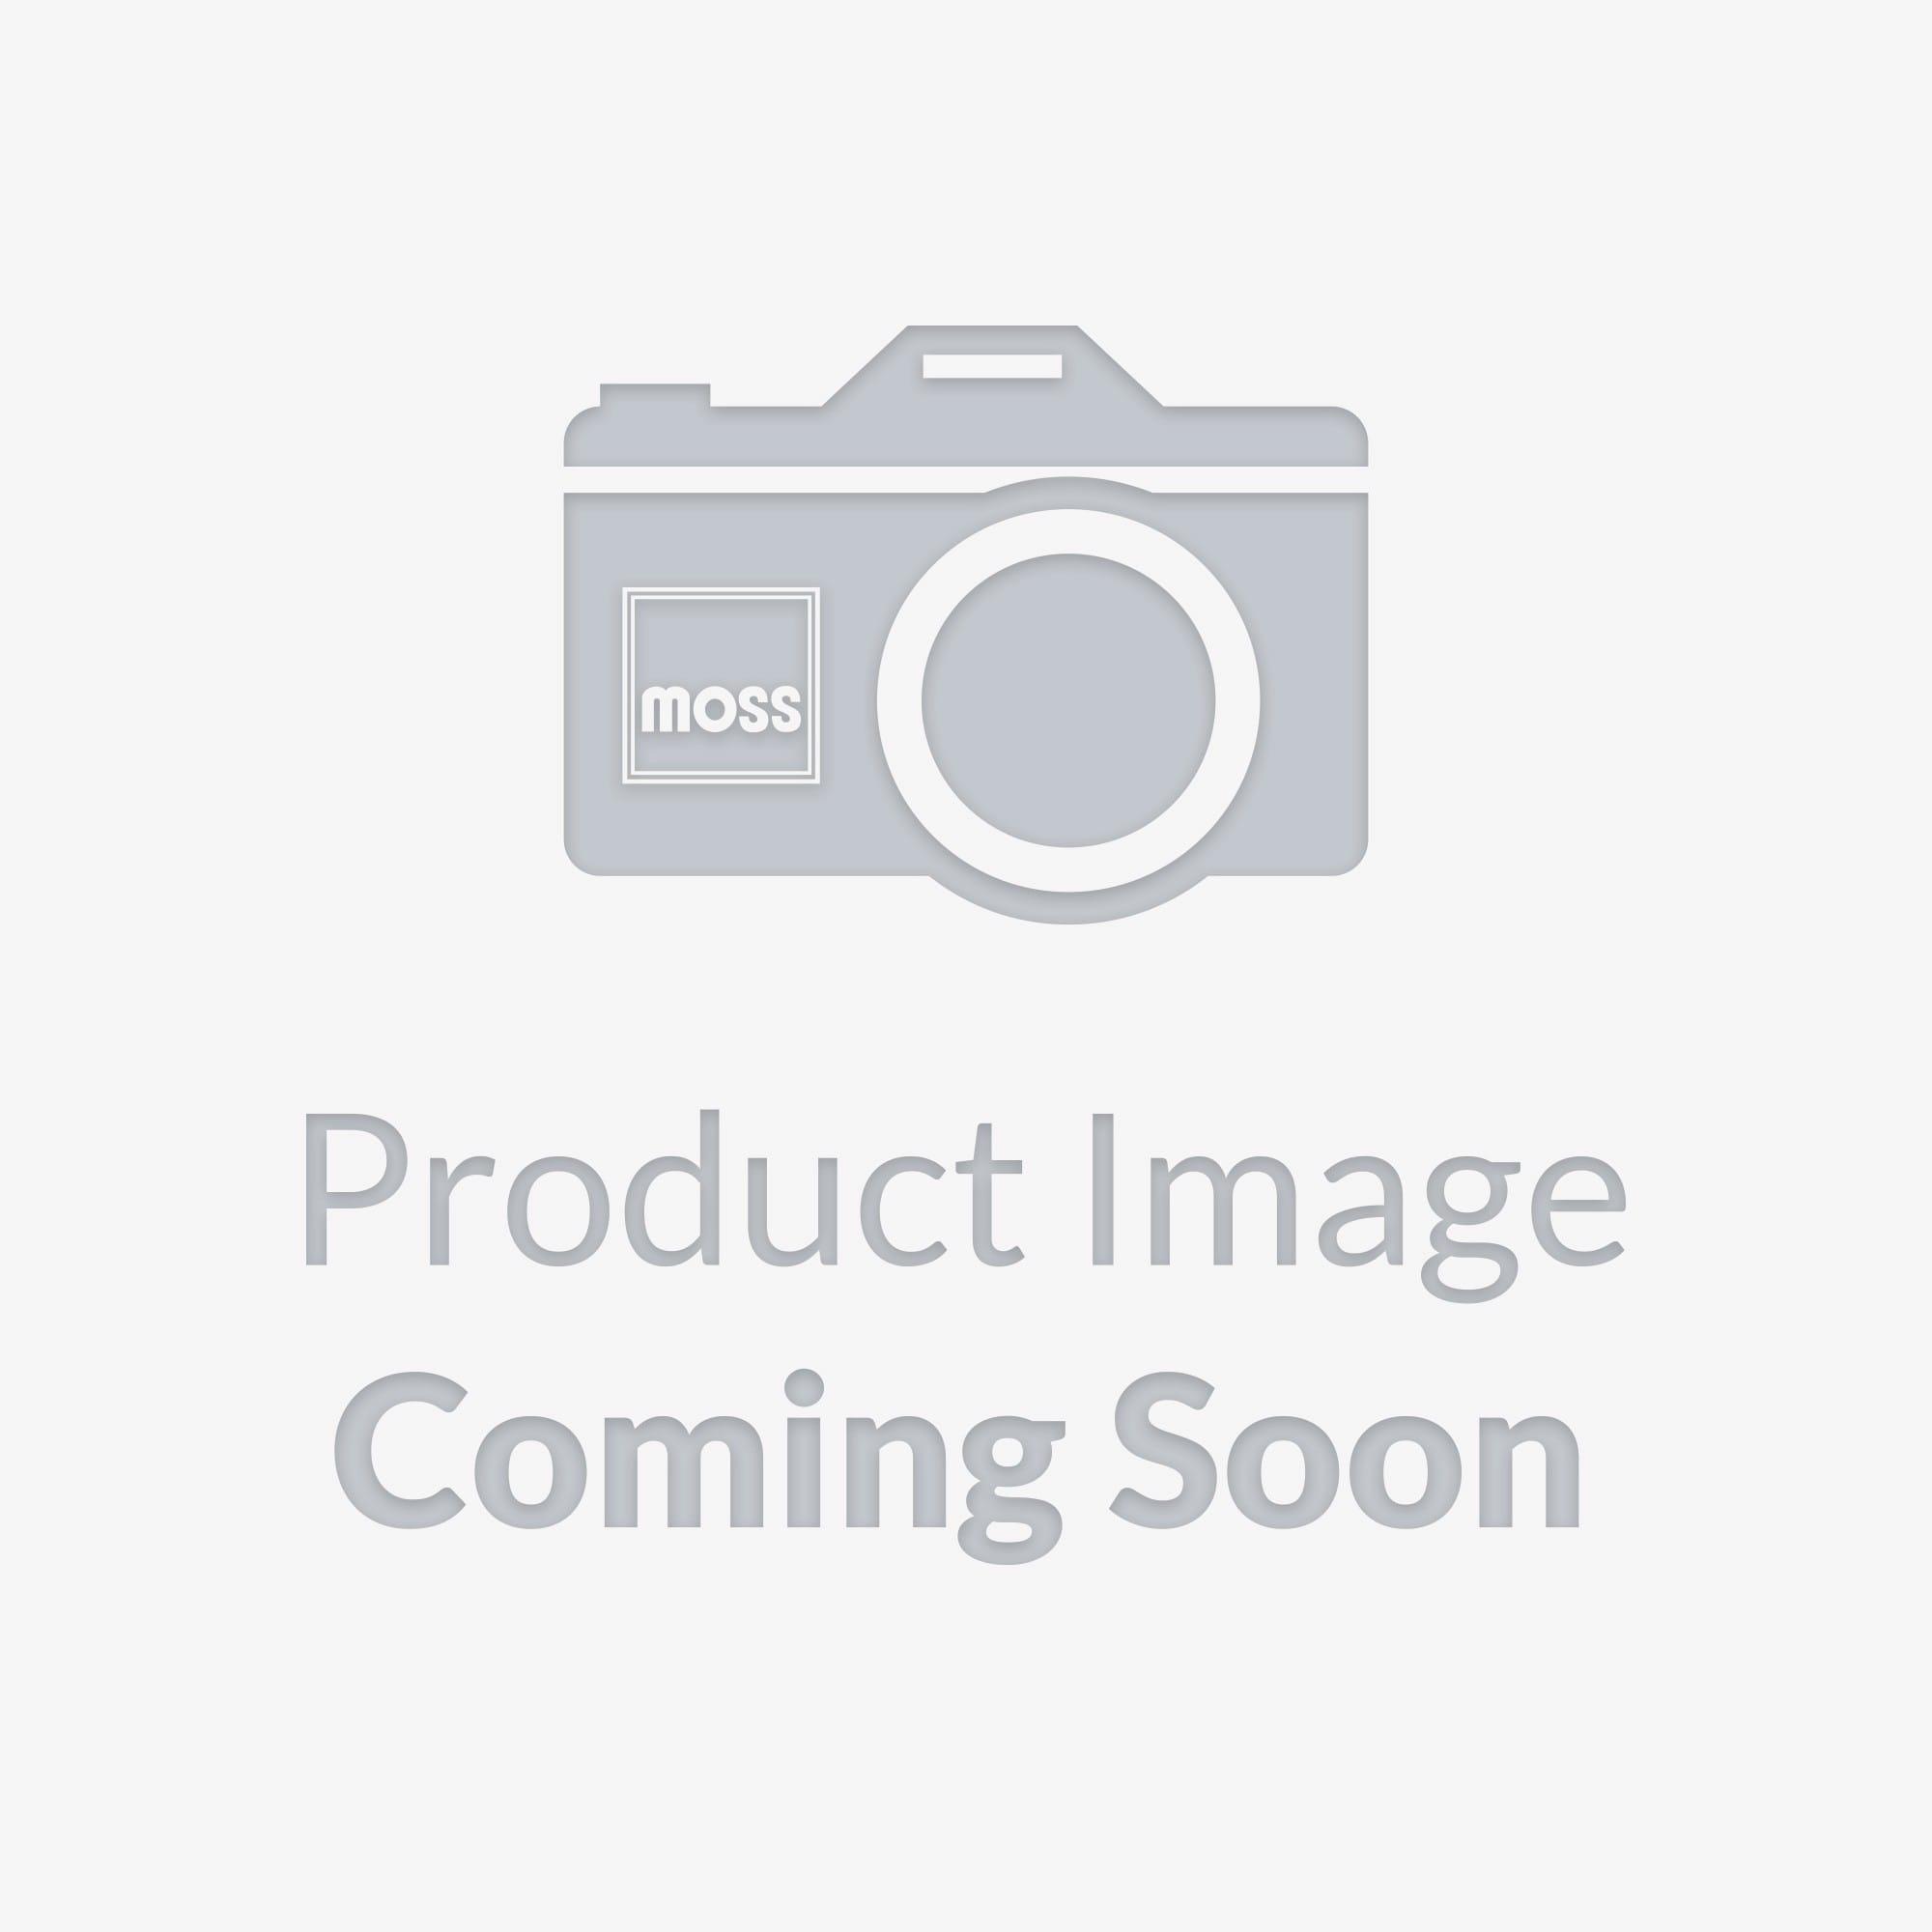 moss motor mga wiring harness